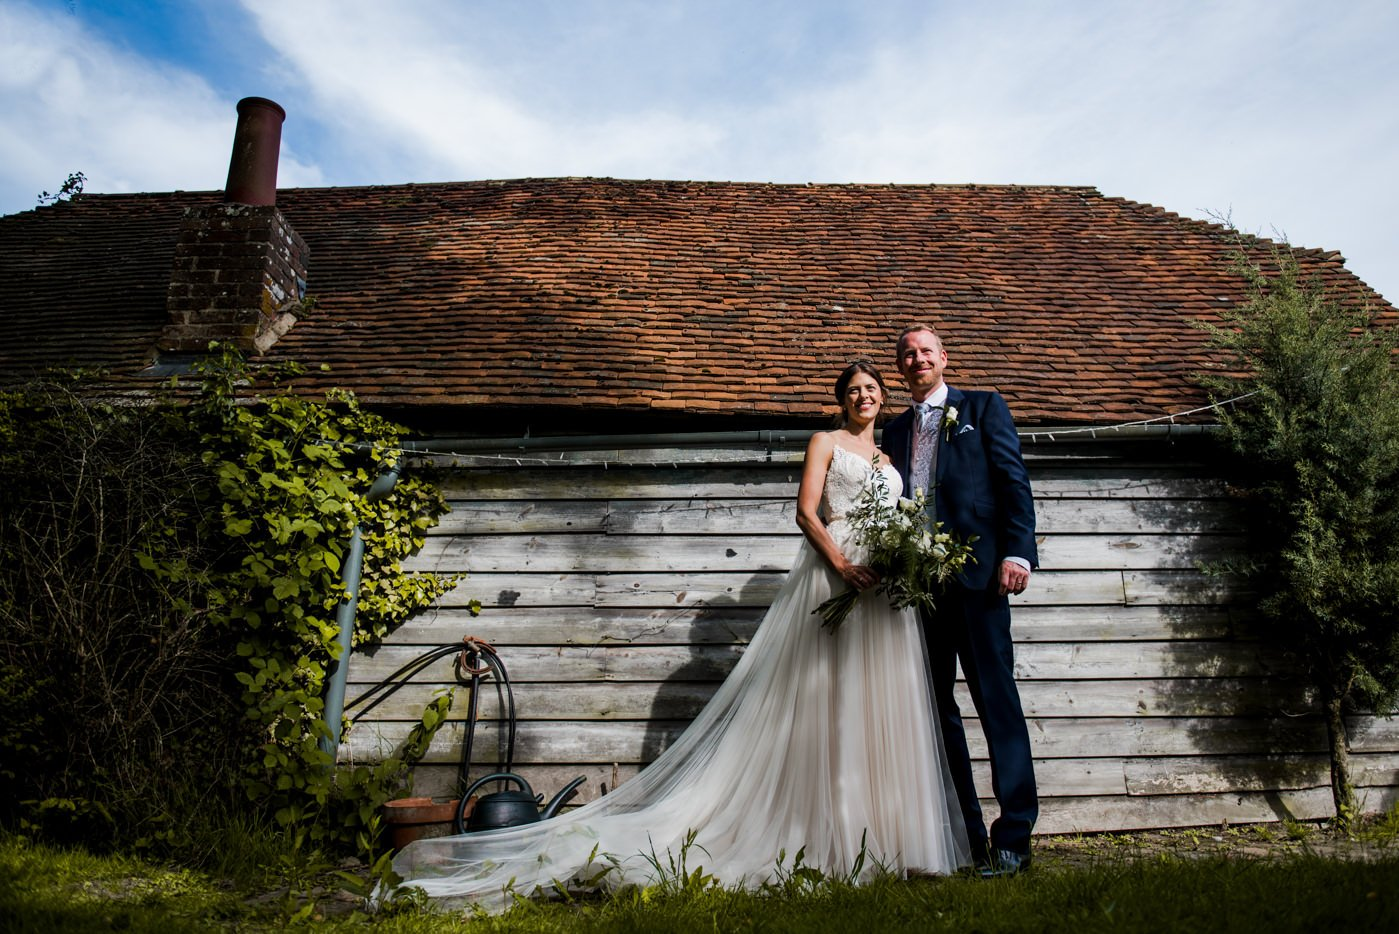 Creative Sprivers Mansion Wedding Photography Portrait